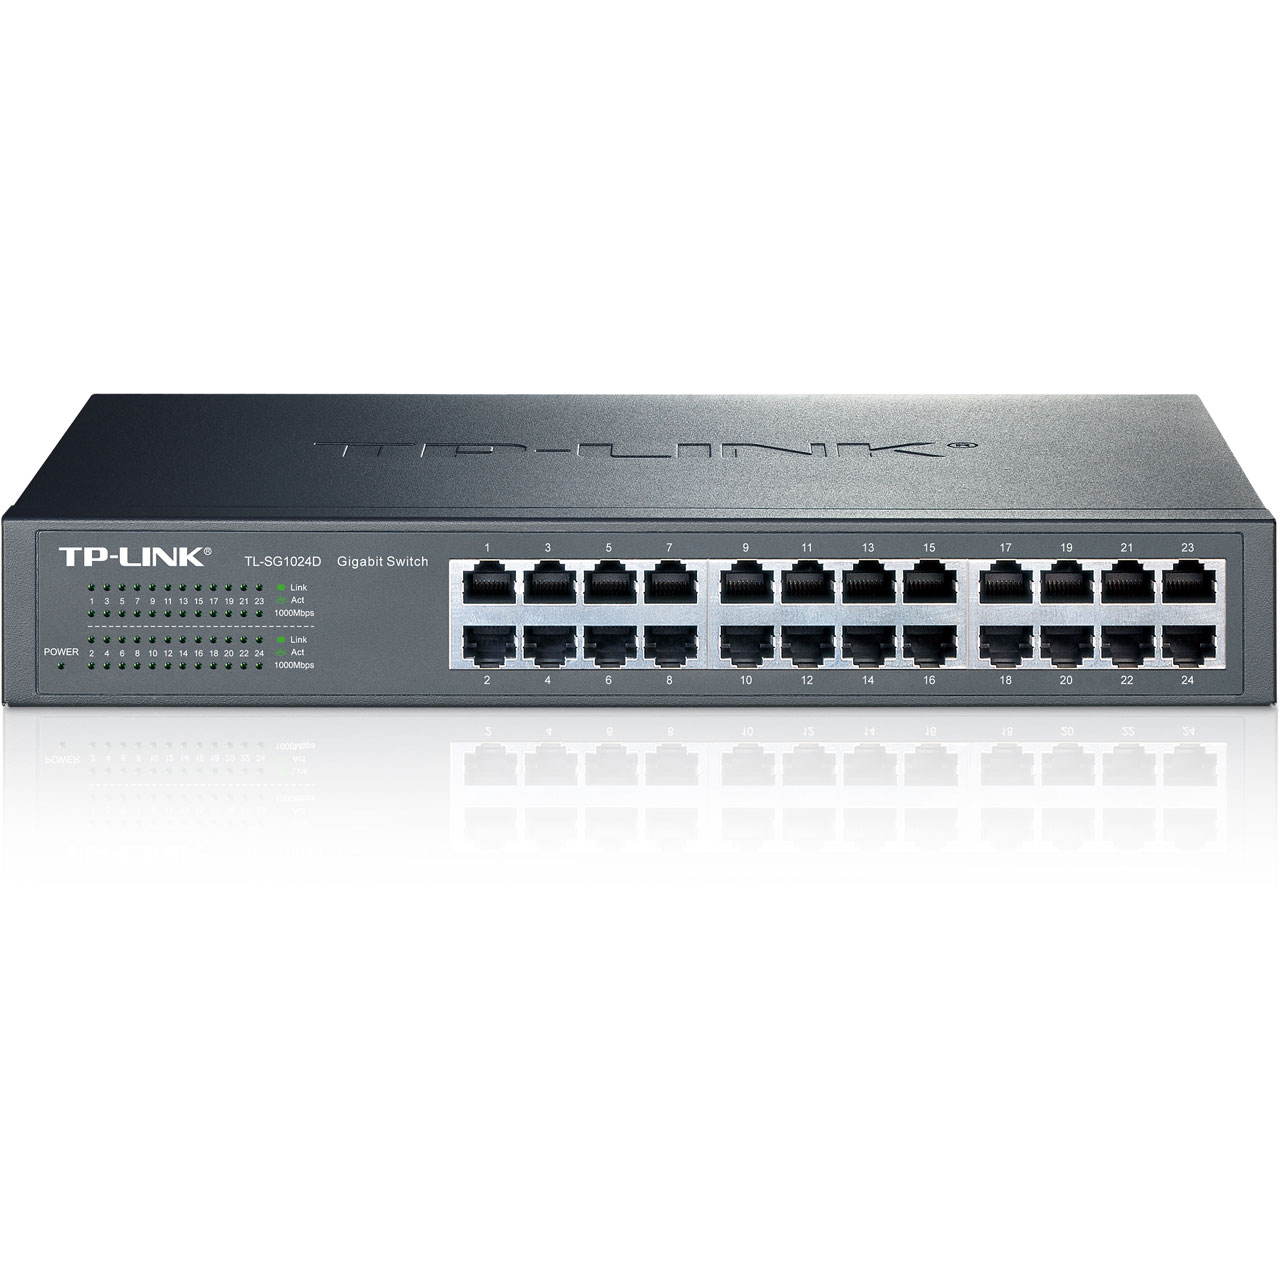 Switch TP-LINK - 24 Ports - Gibabit - TL-SG1024D